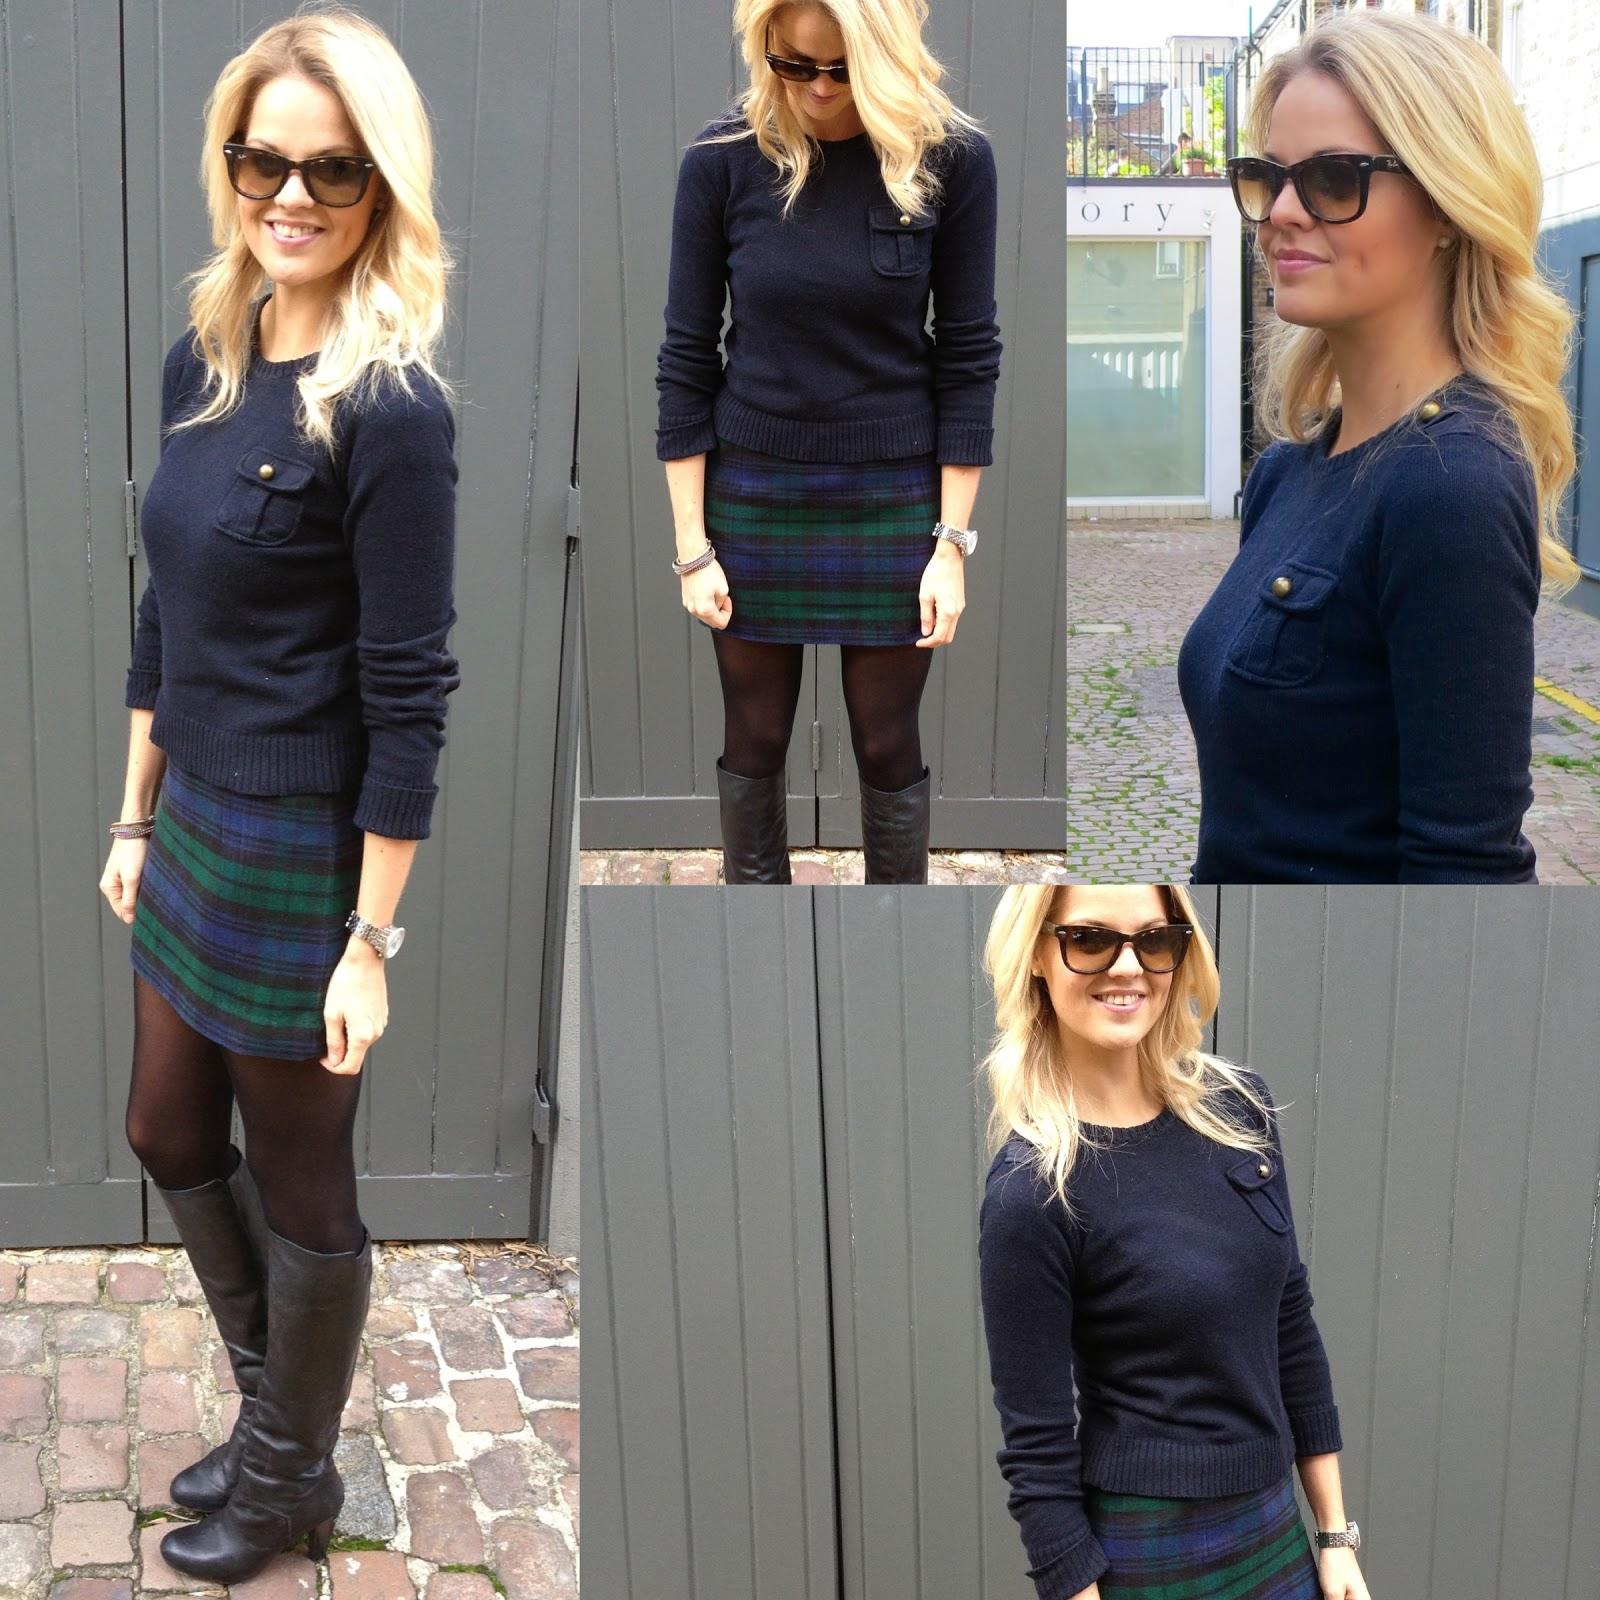 596e5cdfca How to wear: Tartan Mini Skirt Outfit - Dutchess Roz